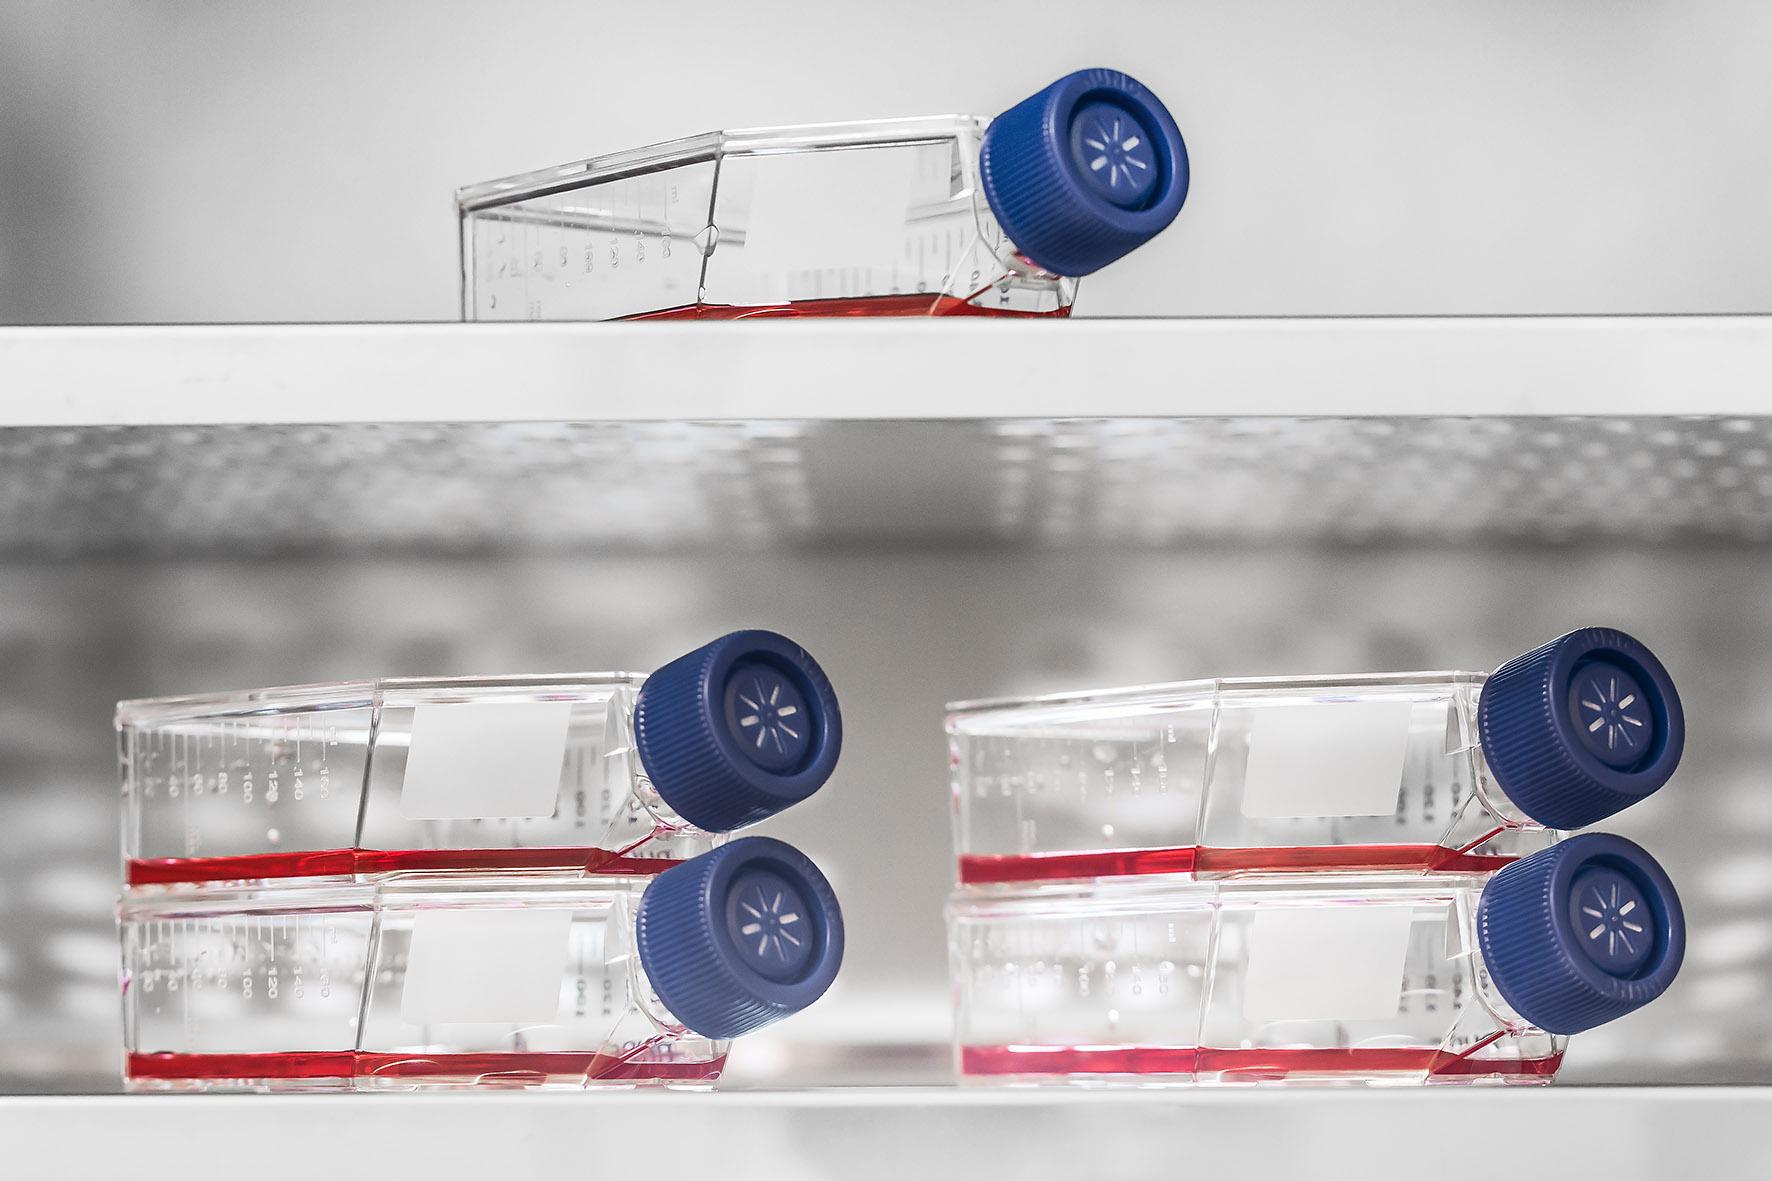 DIZG, Zellkulturflaschen mit Nährlösung